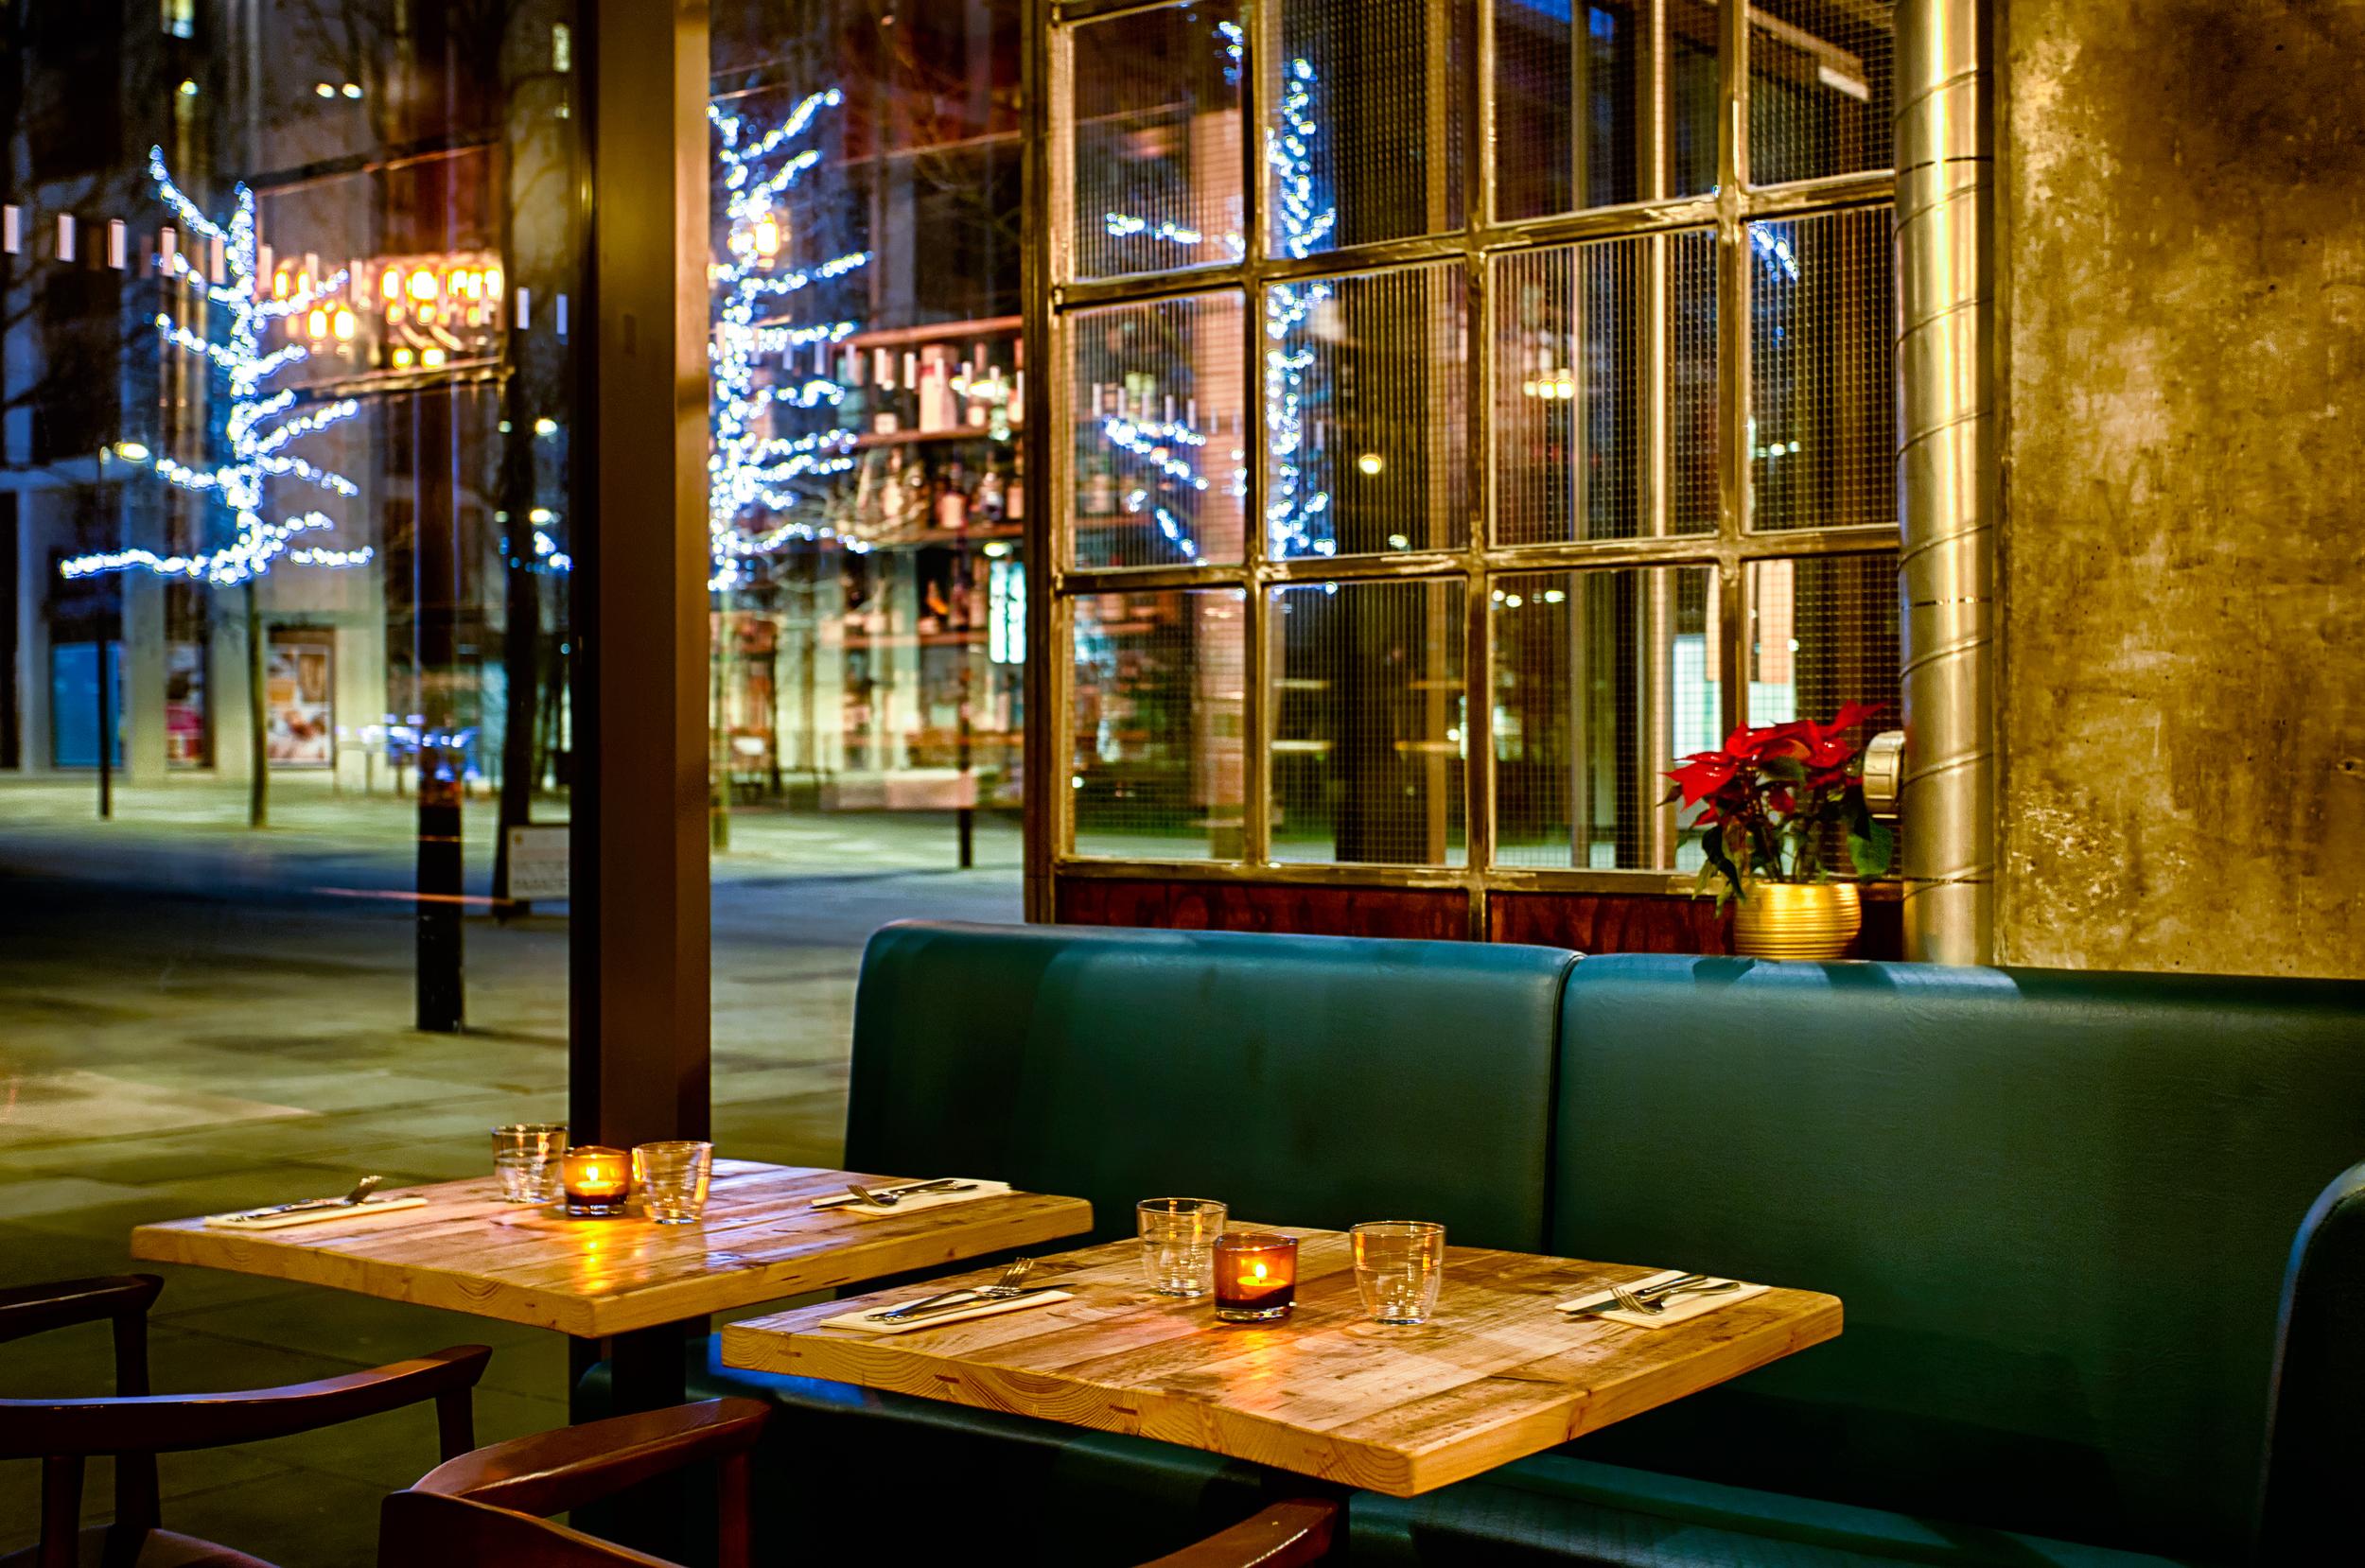 Darkhorse Restaurant_MG_3758_HDR_3.jpg